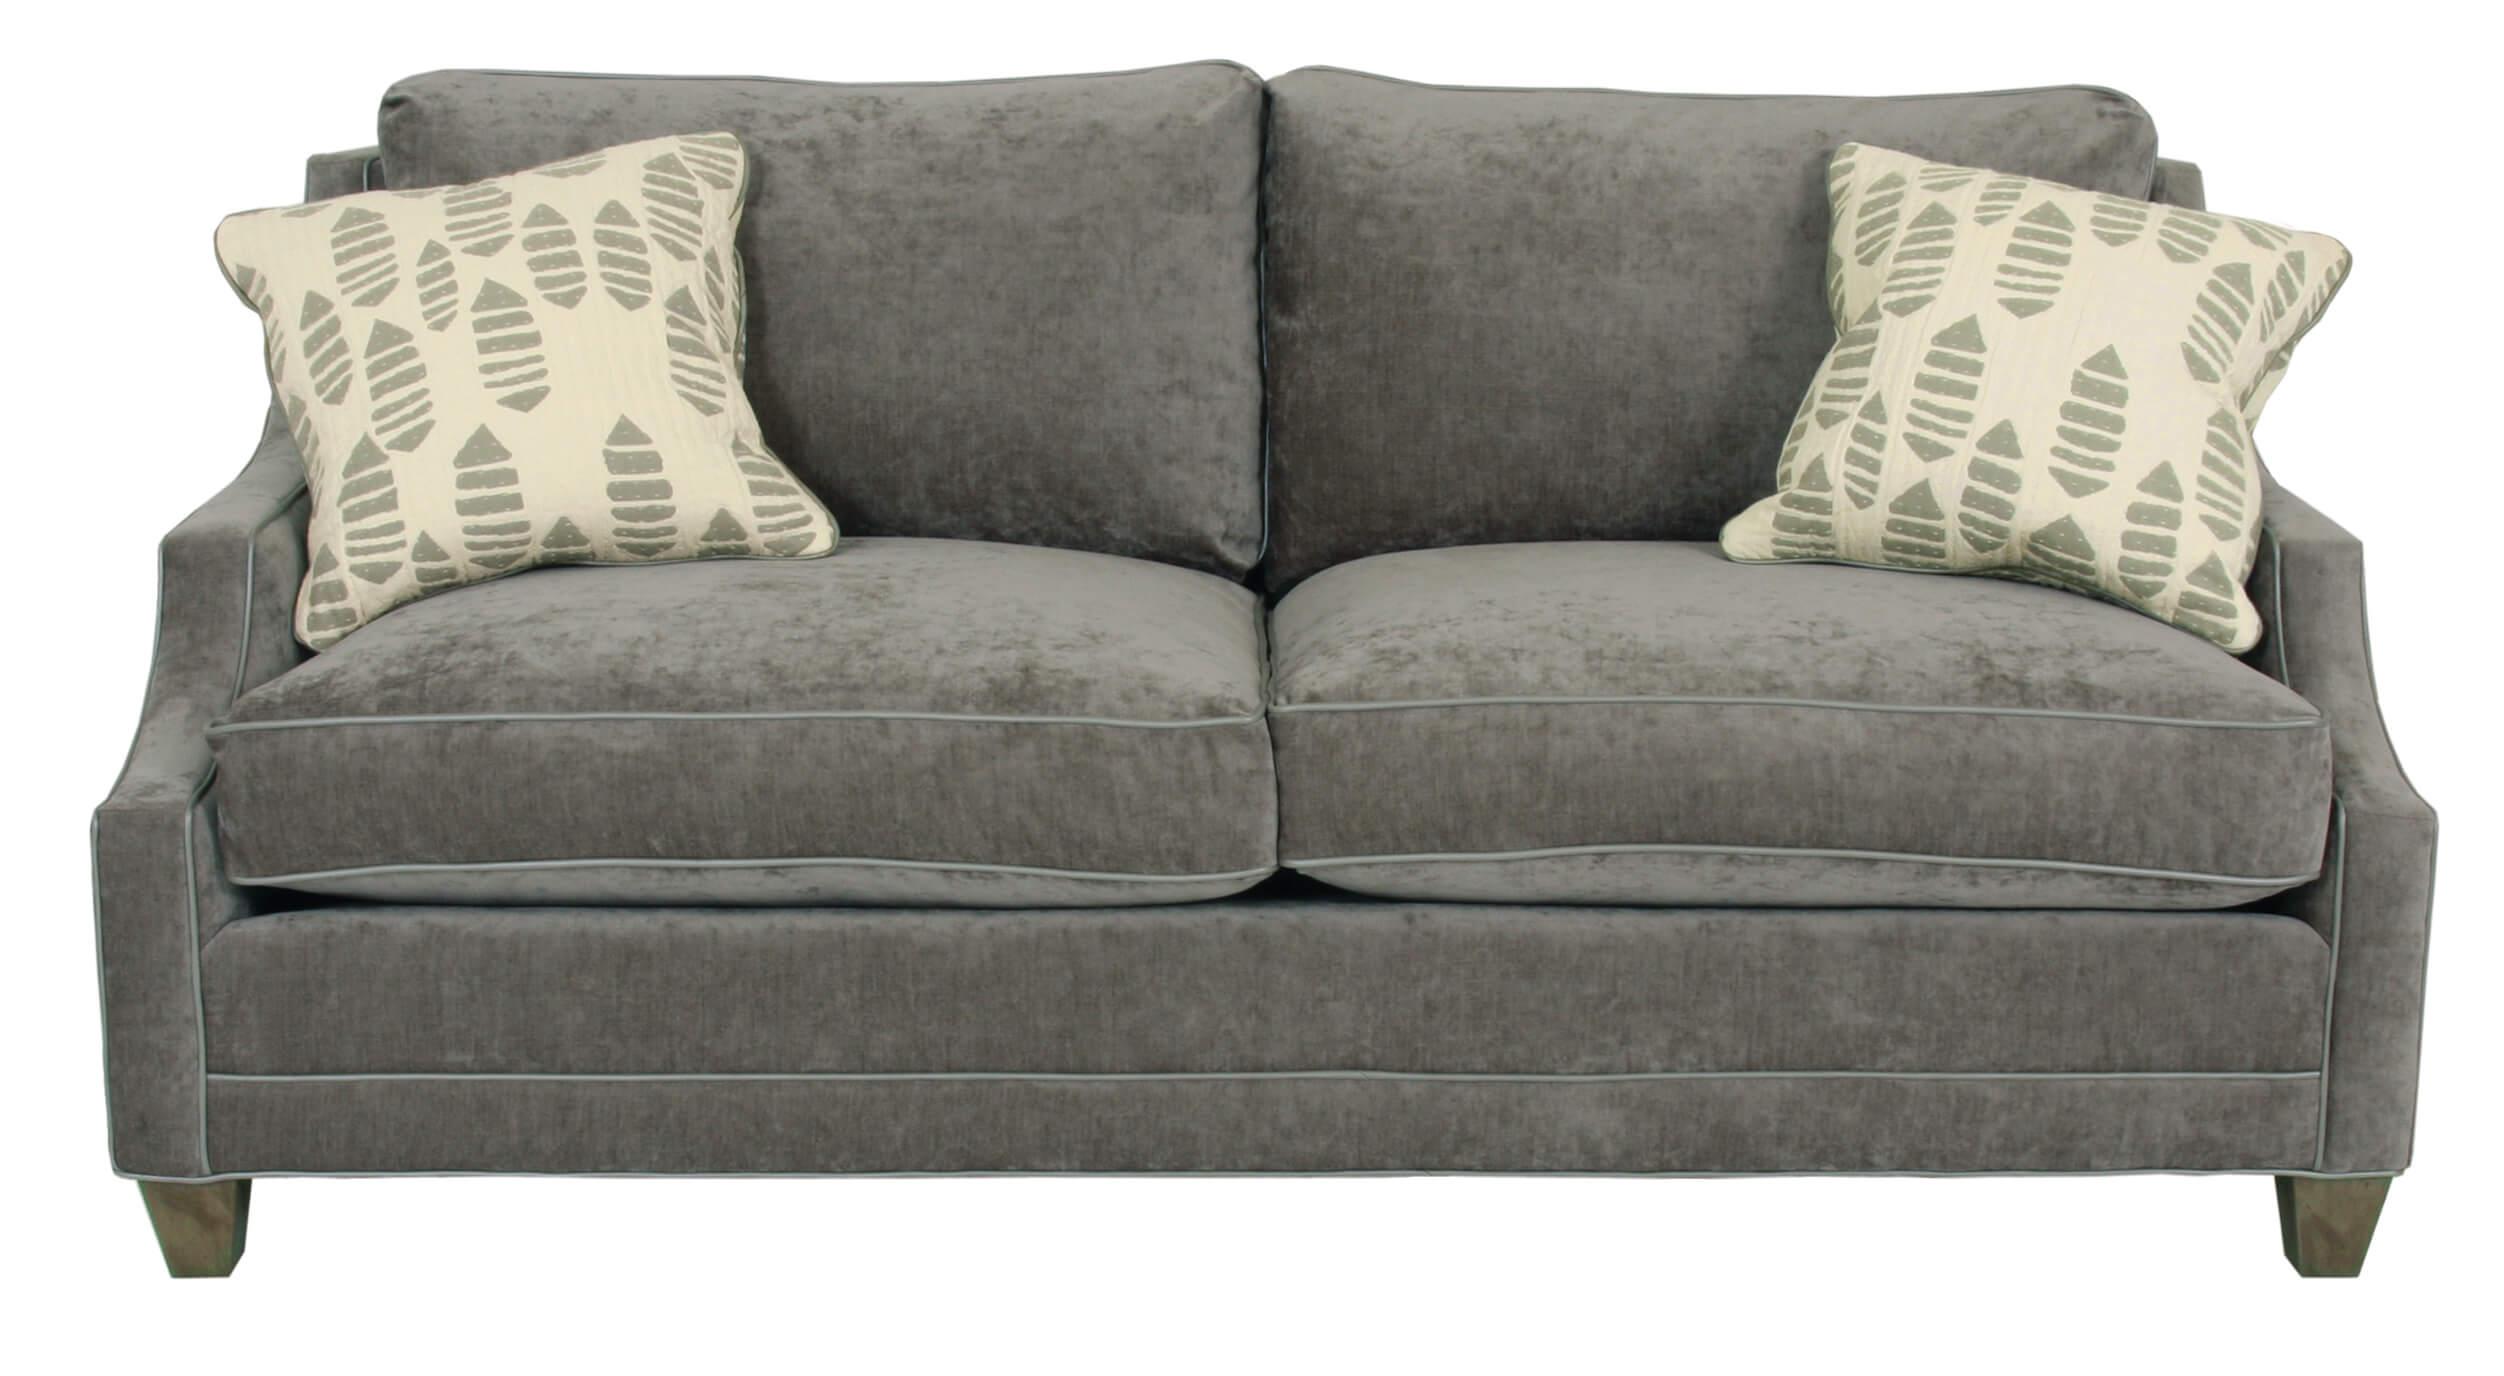 Renee 987-70 Sofa_Modern Casual